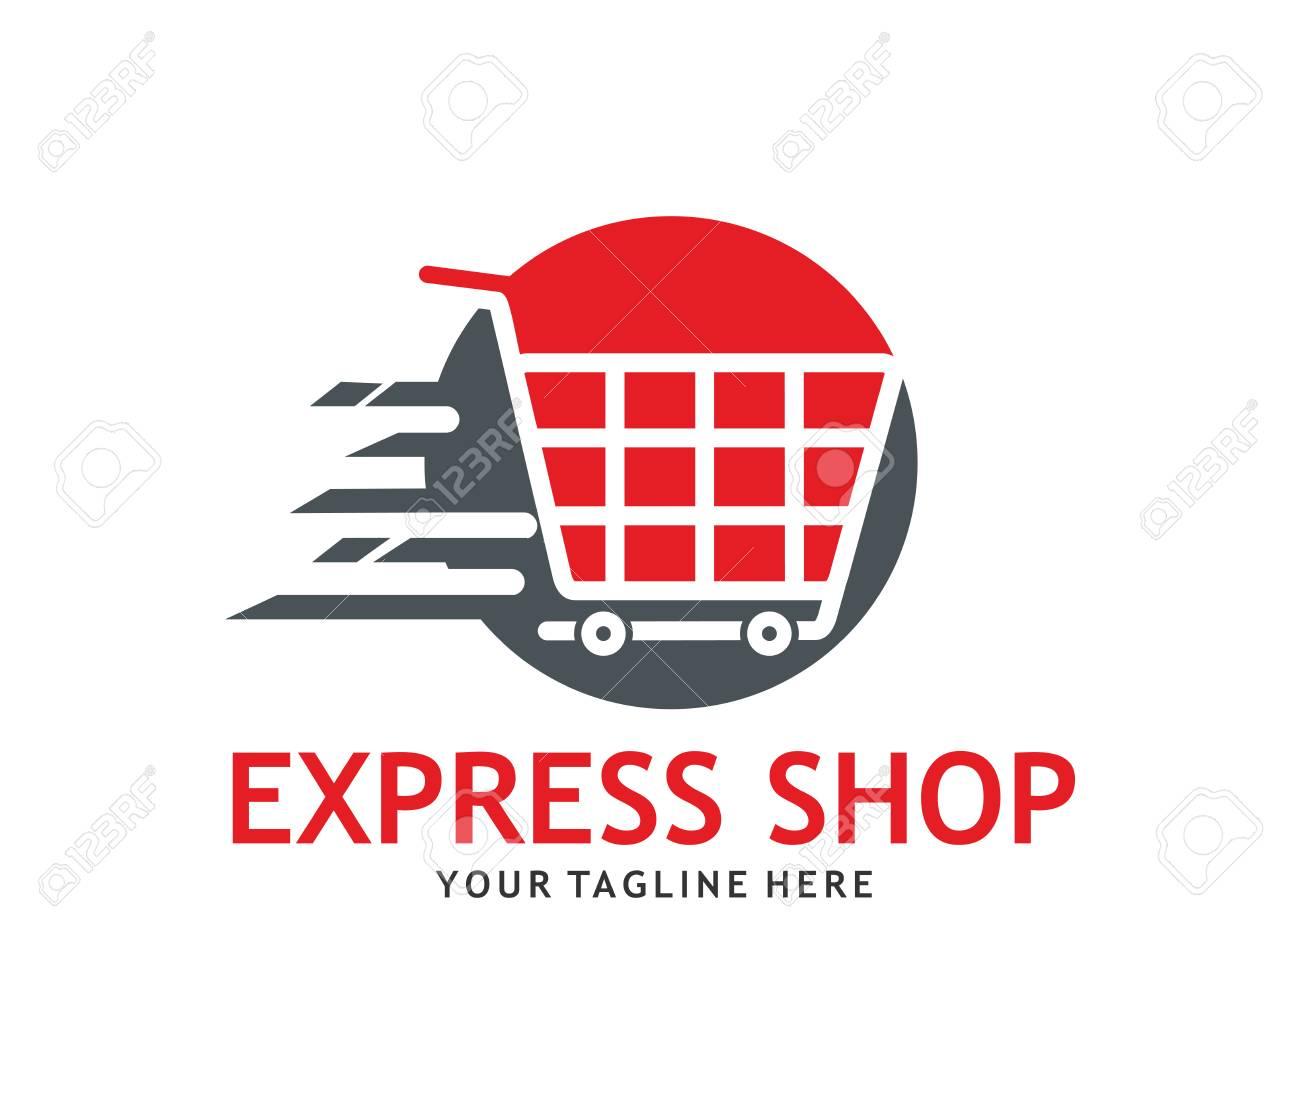 Express Online Shop Logo Concept Design Template Royalty Free